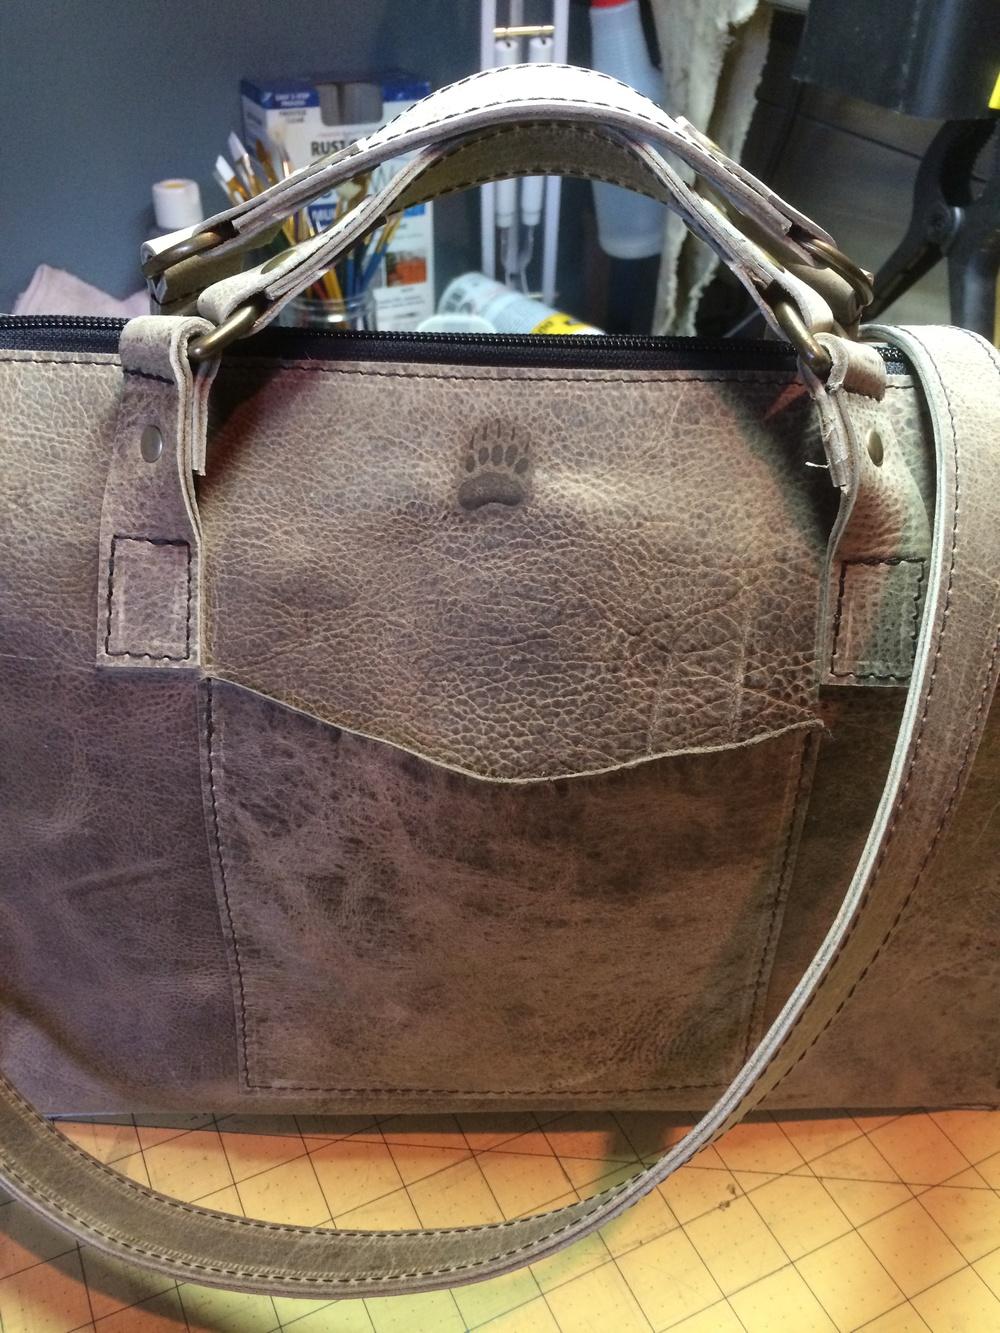 Filbert Bag Front Paw Brand.JPG